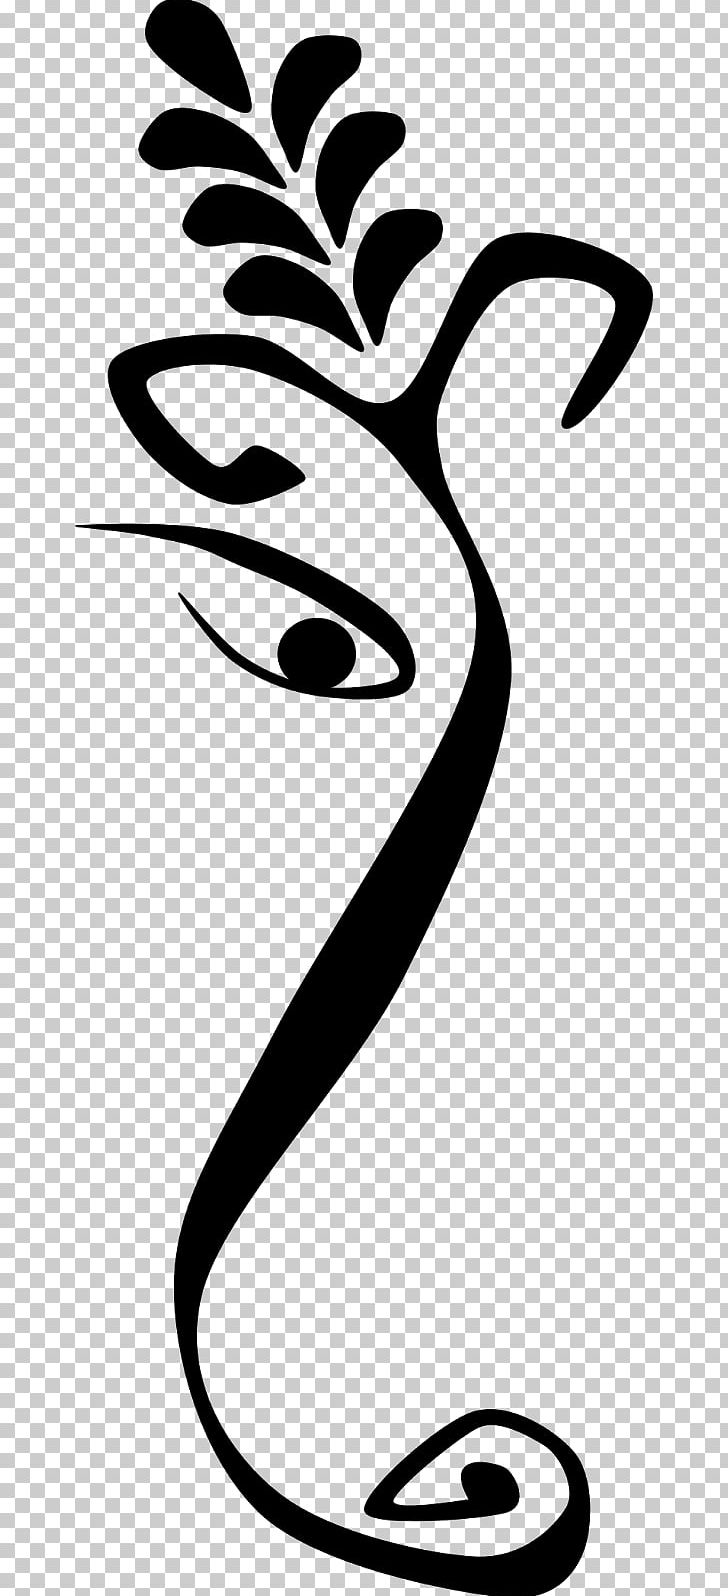 Ganesha Line Art PNG, Clipart, Area, Art, Artwork, Black, Black And White Free PNG Download